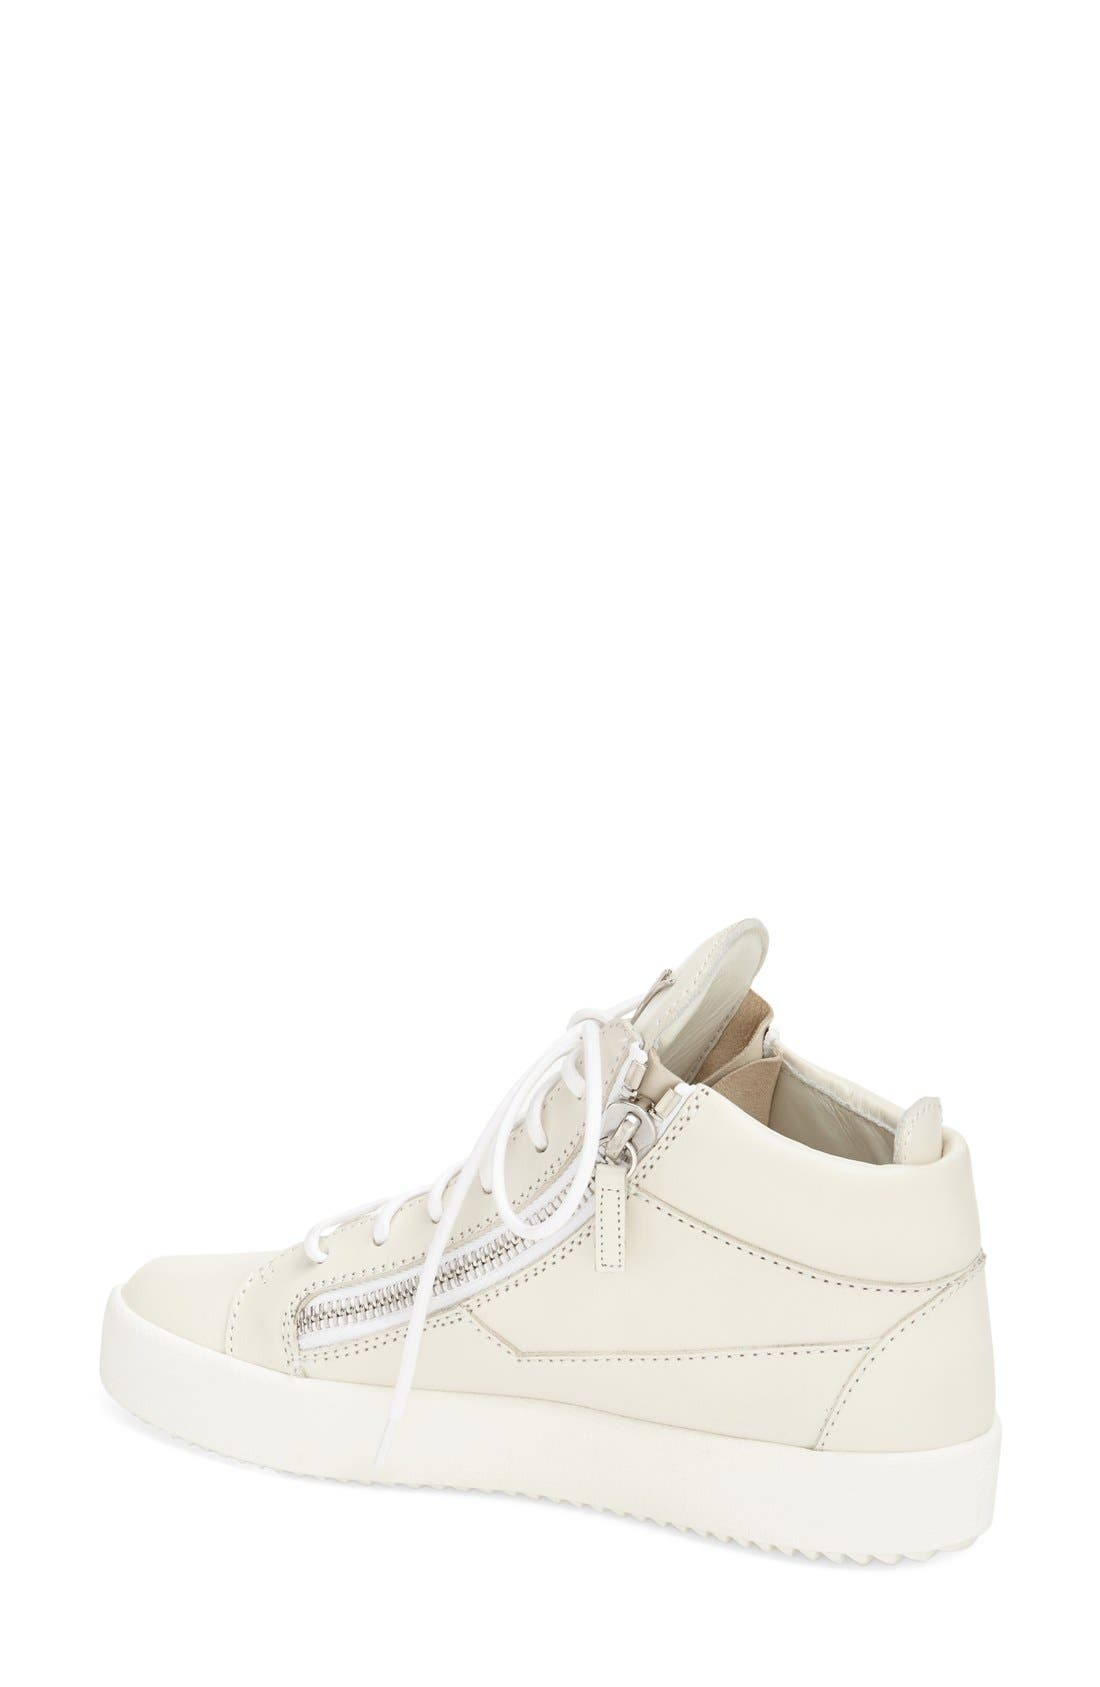 High Top Sneaker,                             Alternate thumbnail 2, color,                             020